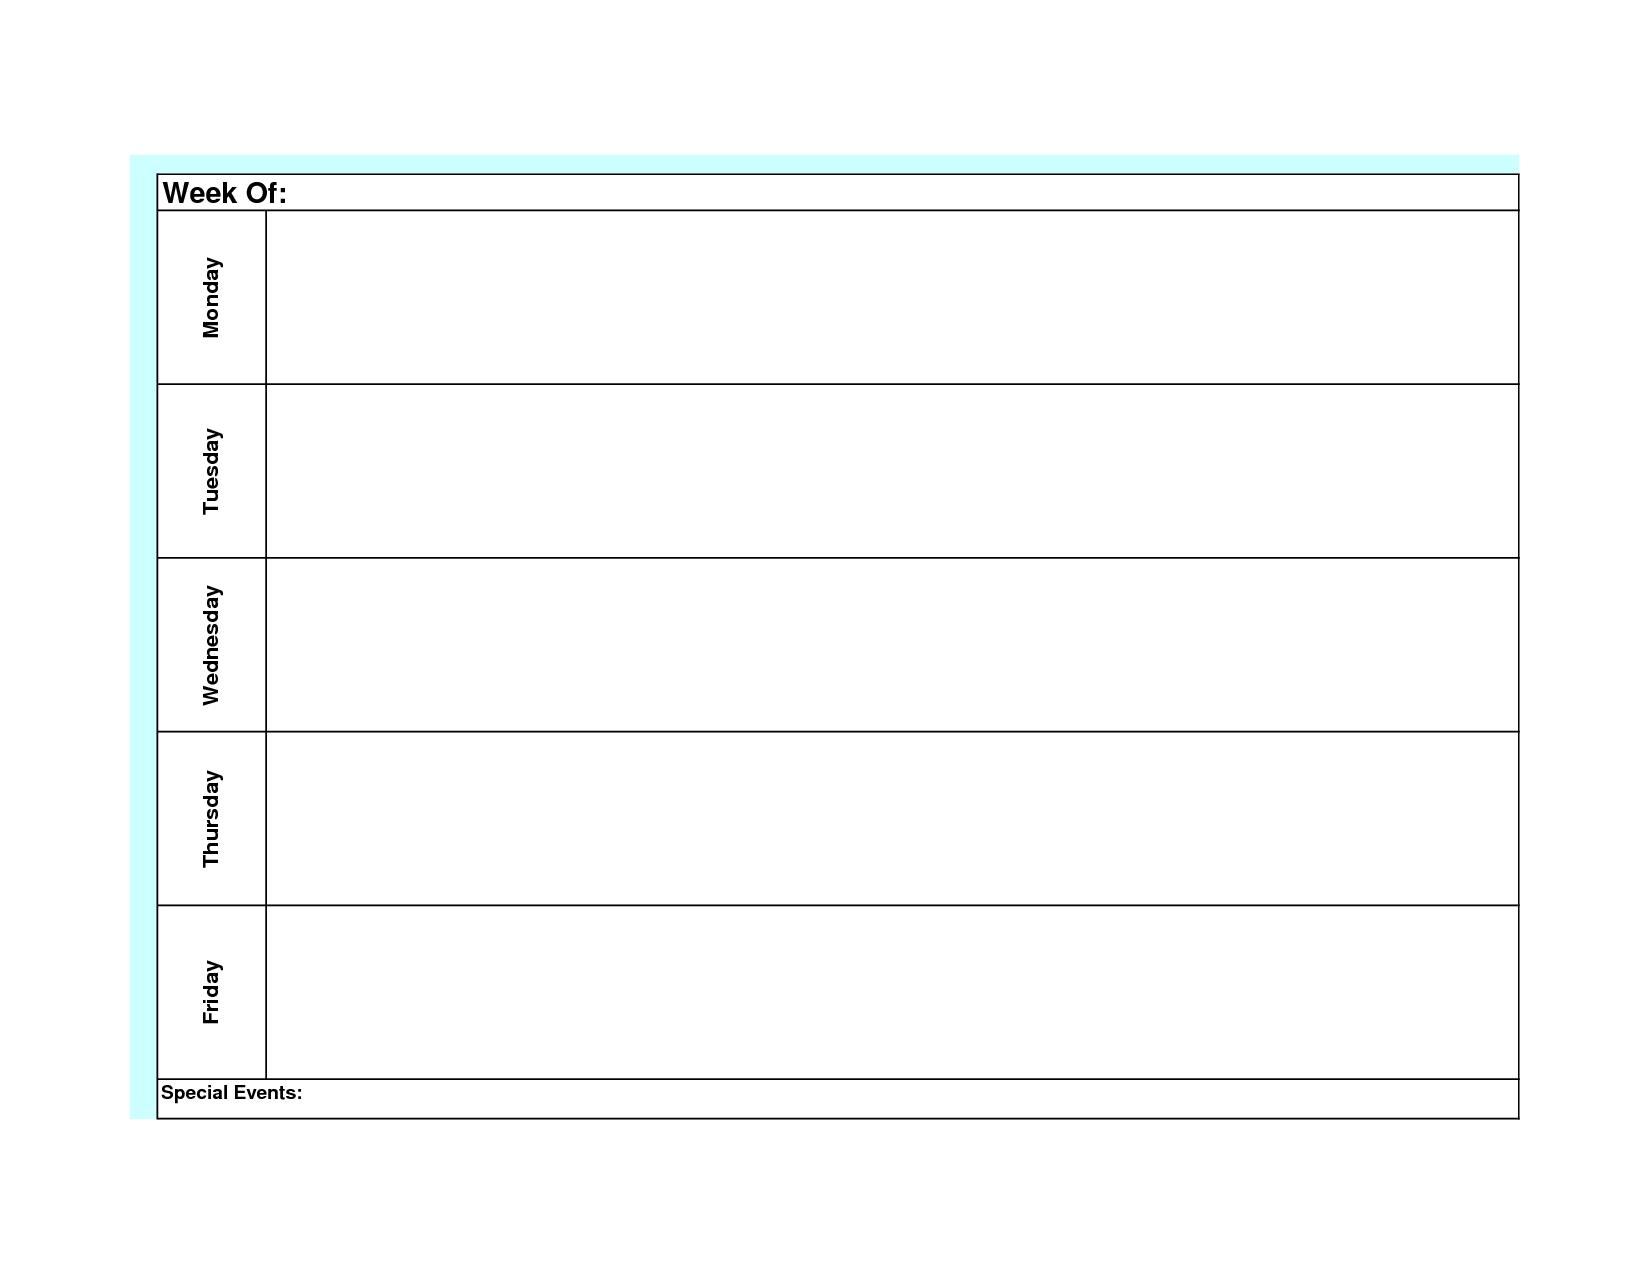 Blank Weekly Calendar Template Monday Friday | Planner-Blank Monday Through Friday Calendars